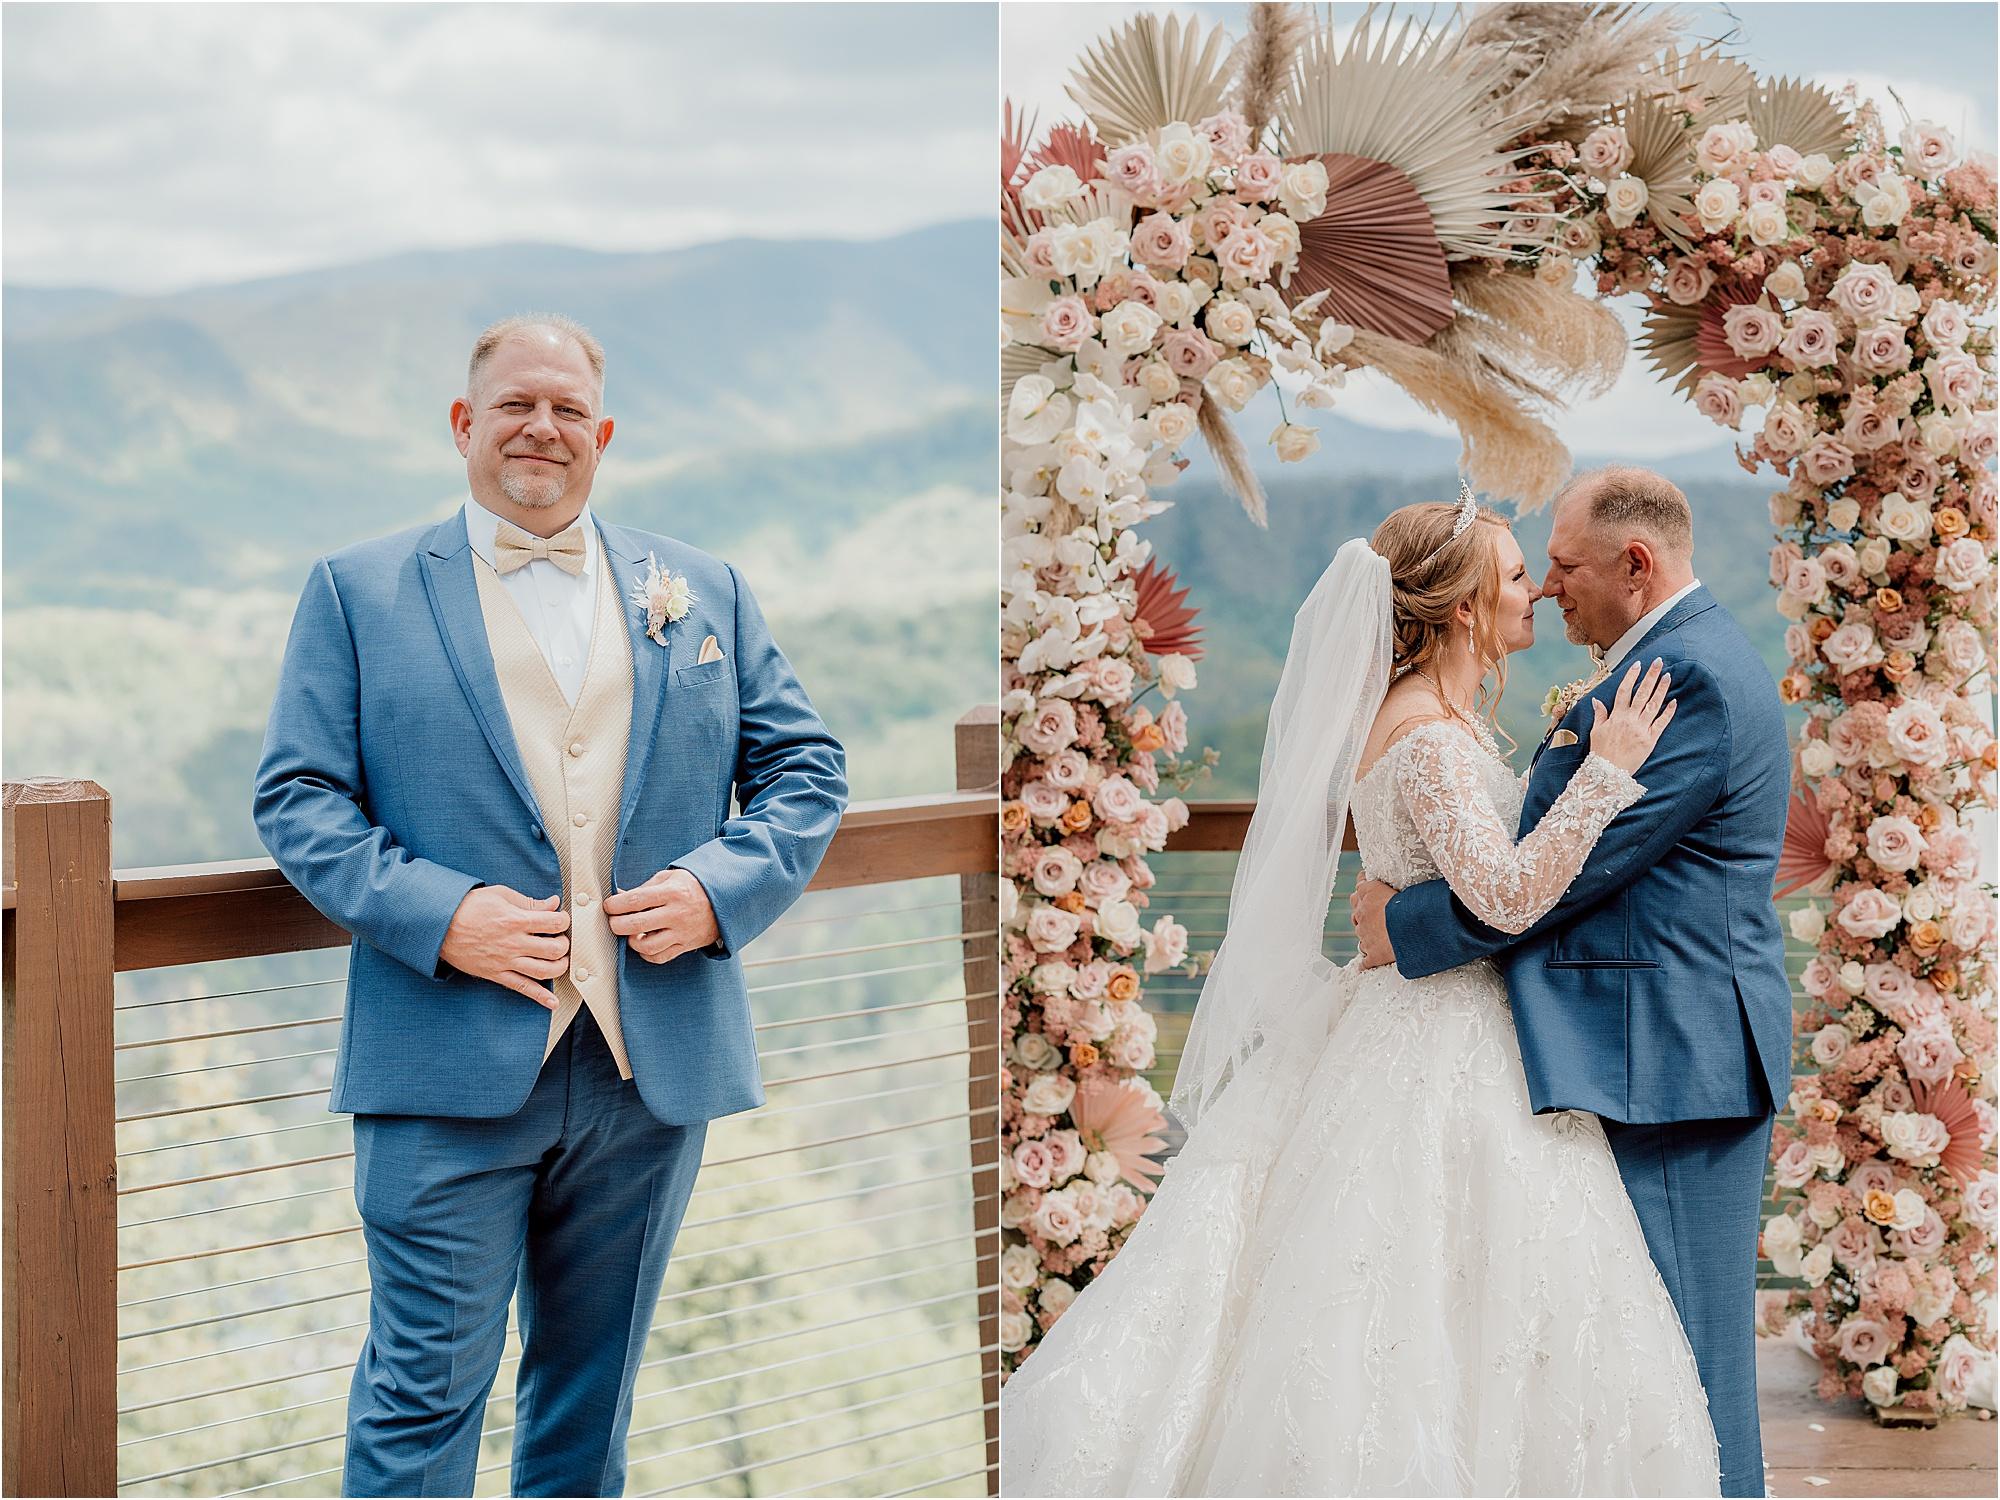 whimsical wedding photos under floral arbor